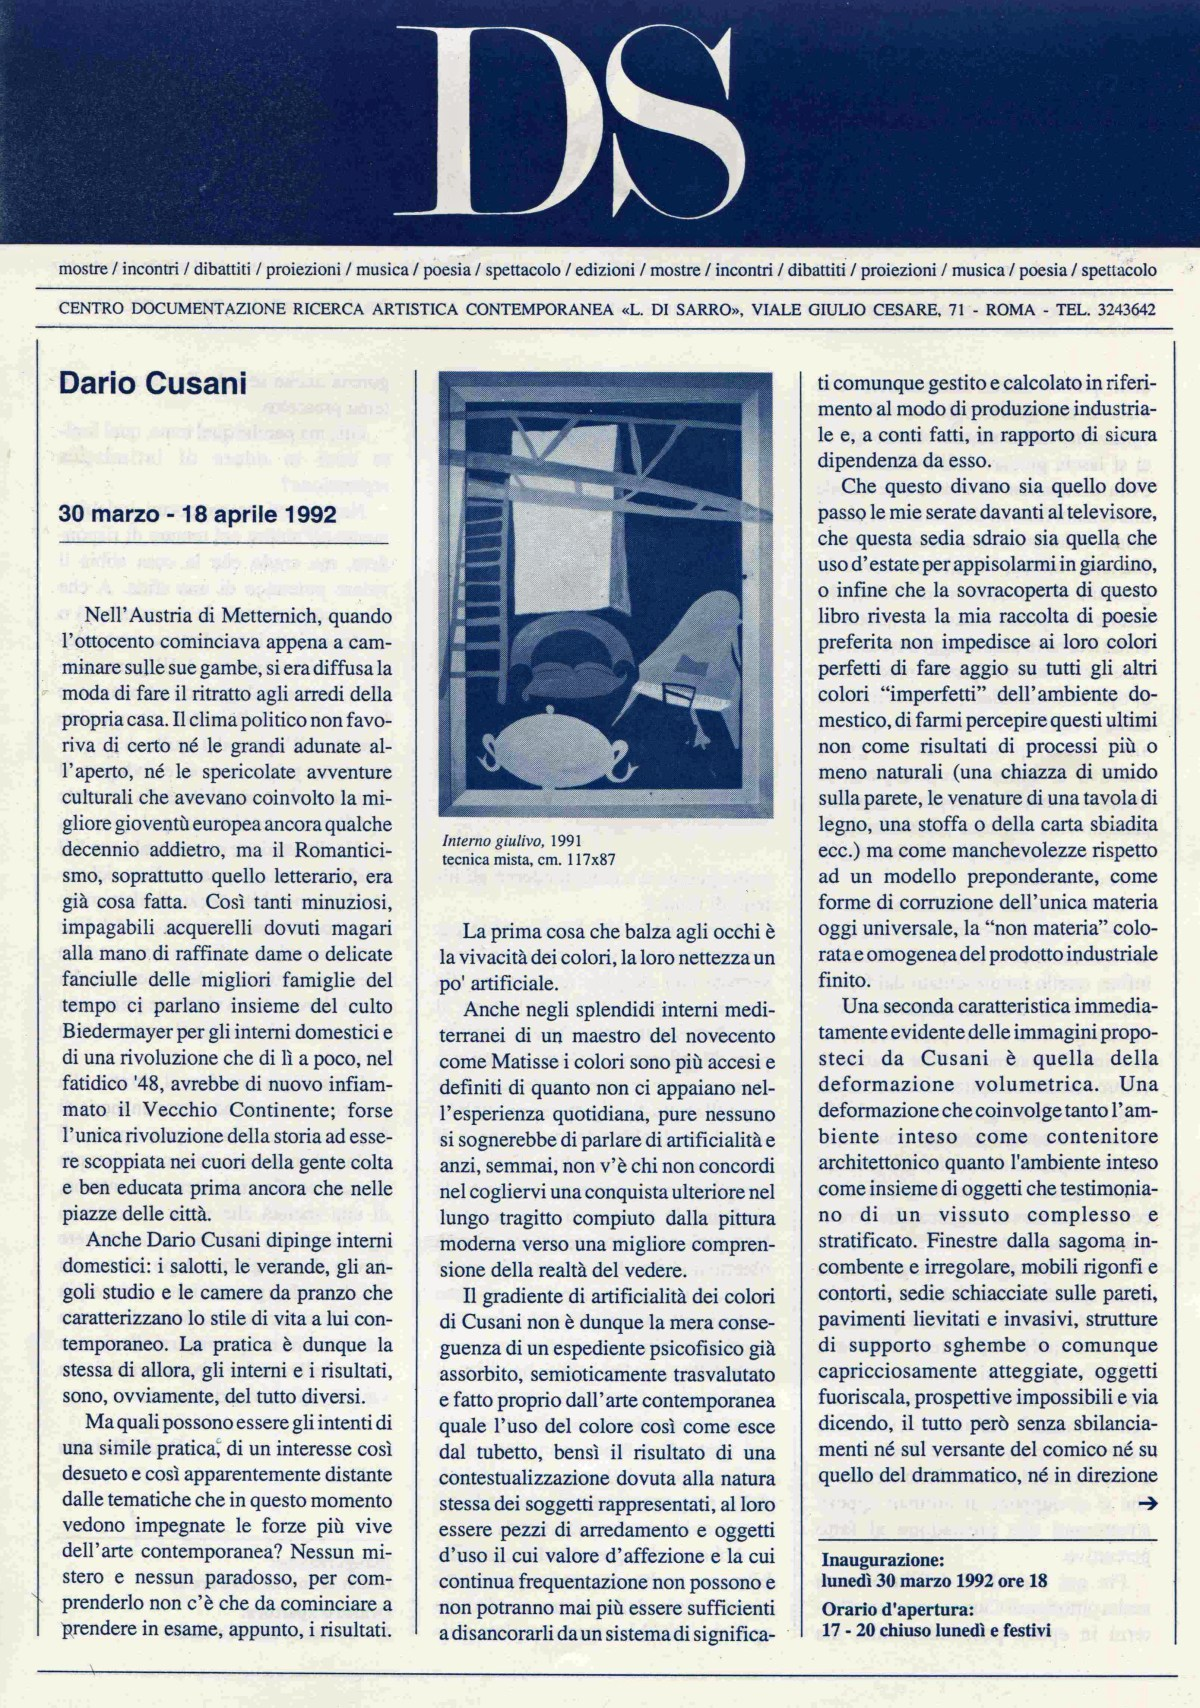 Dario Cusani  30 marzo - 18 aprile 1992